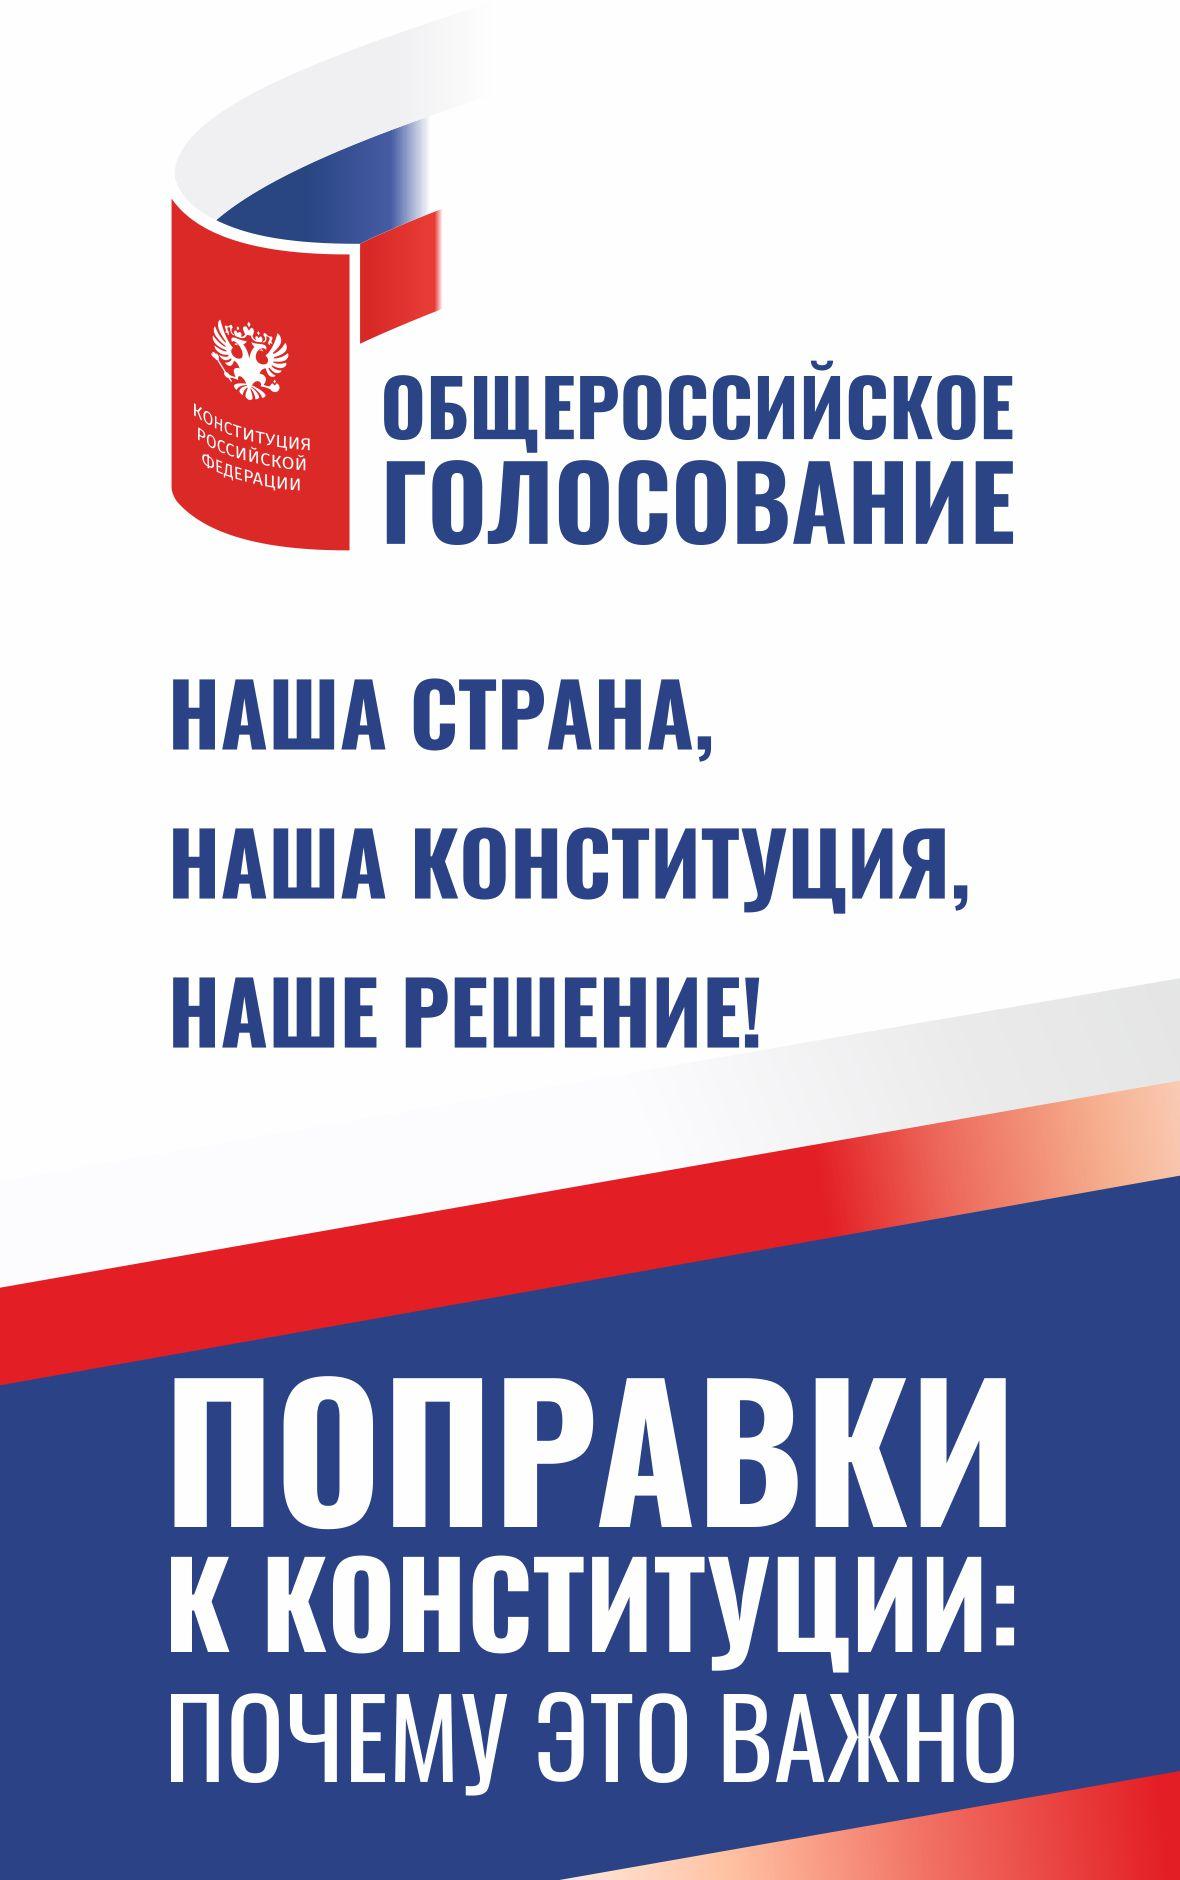 http://конституция2020.рф/